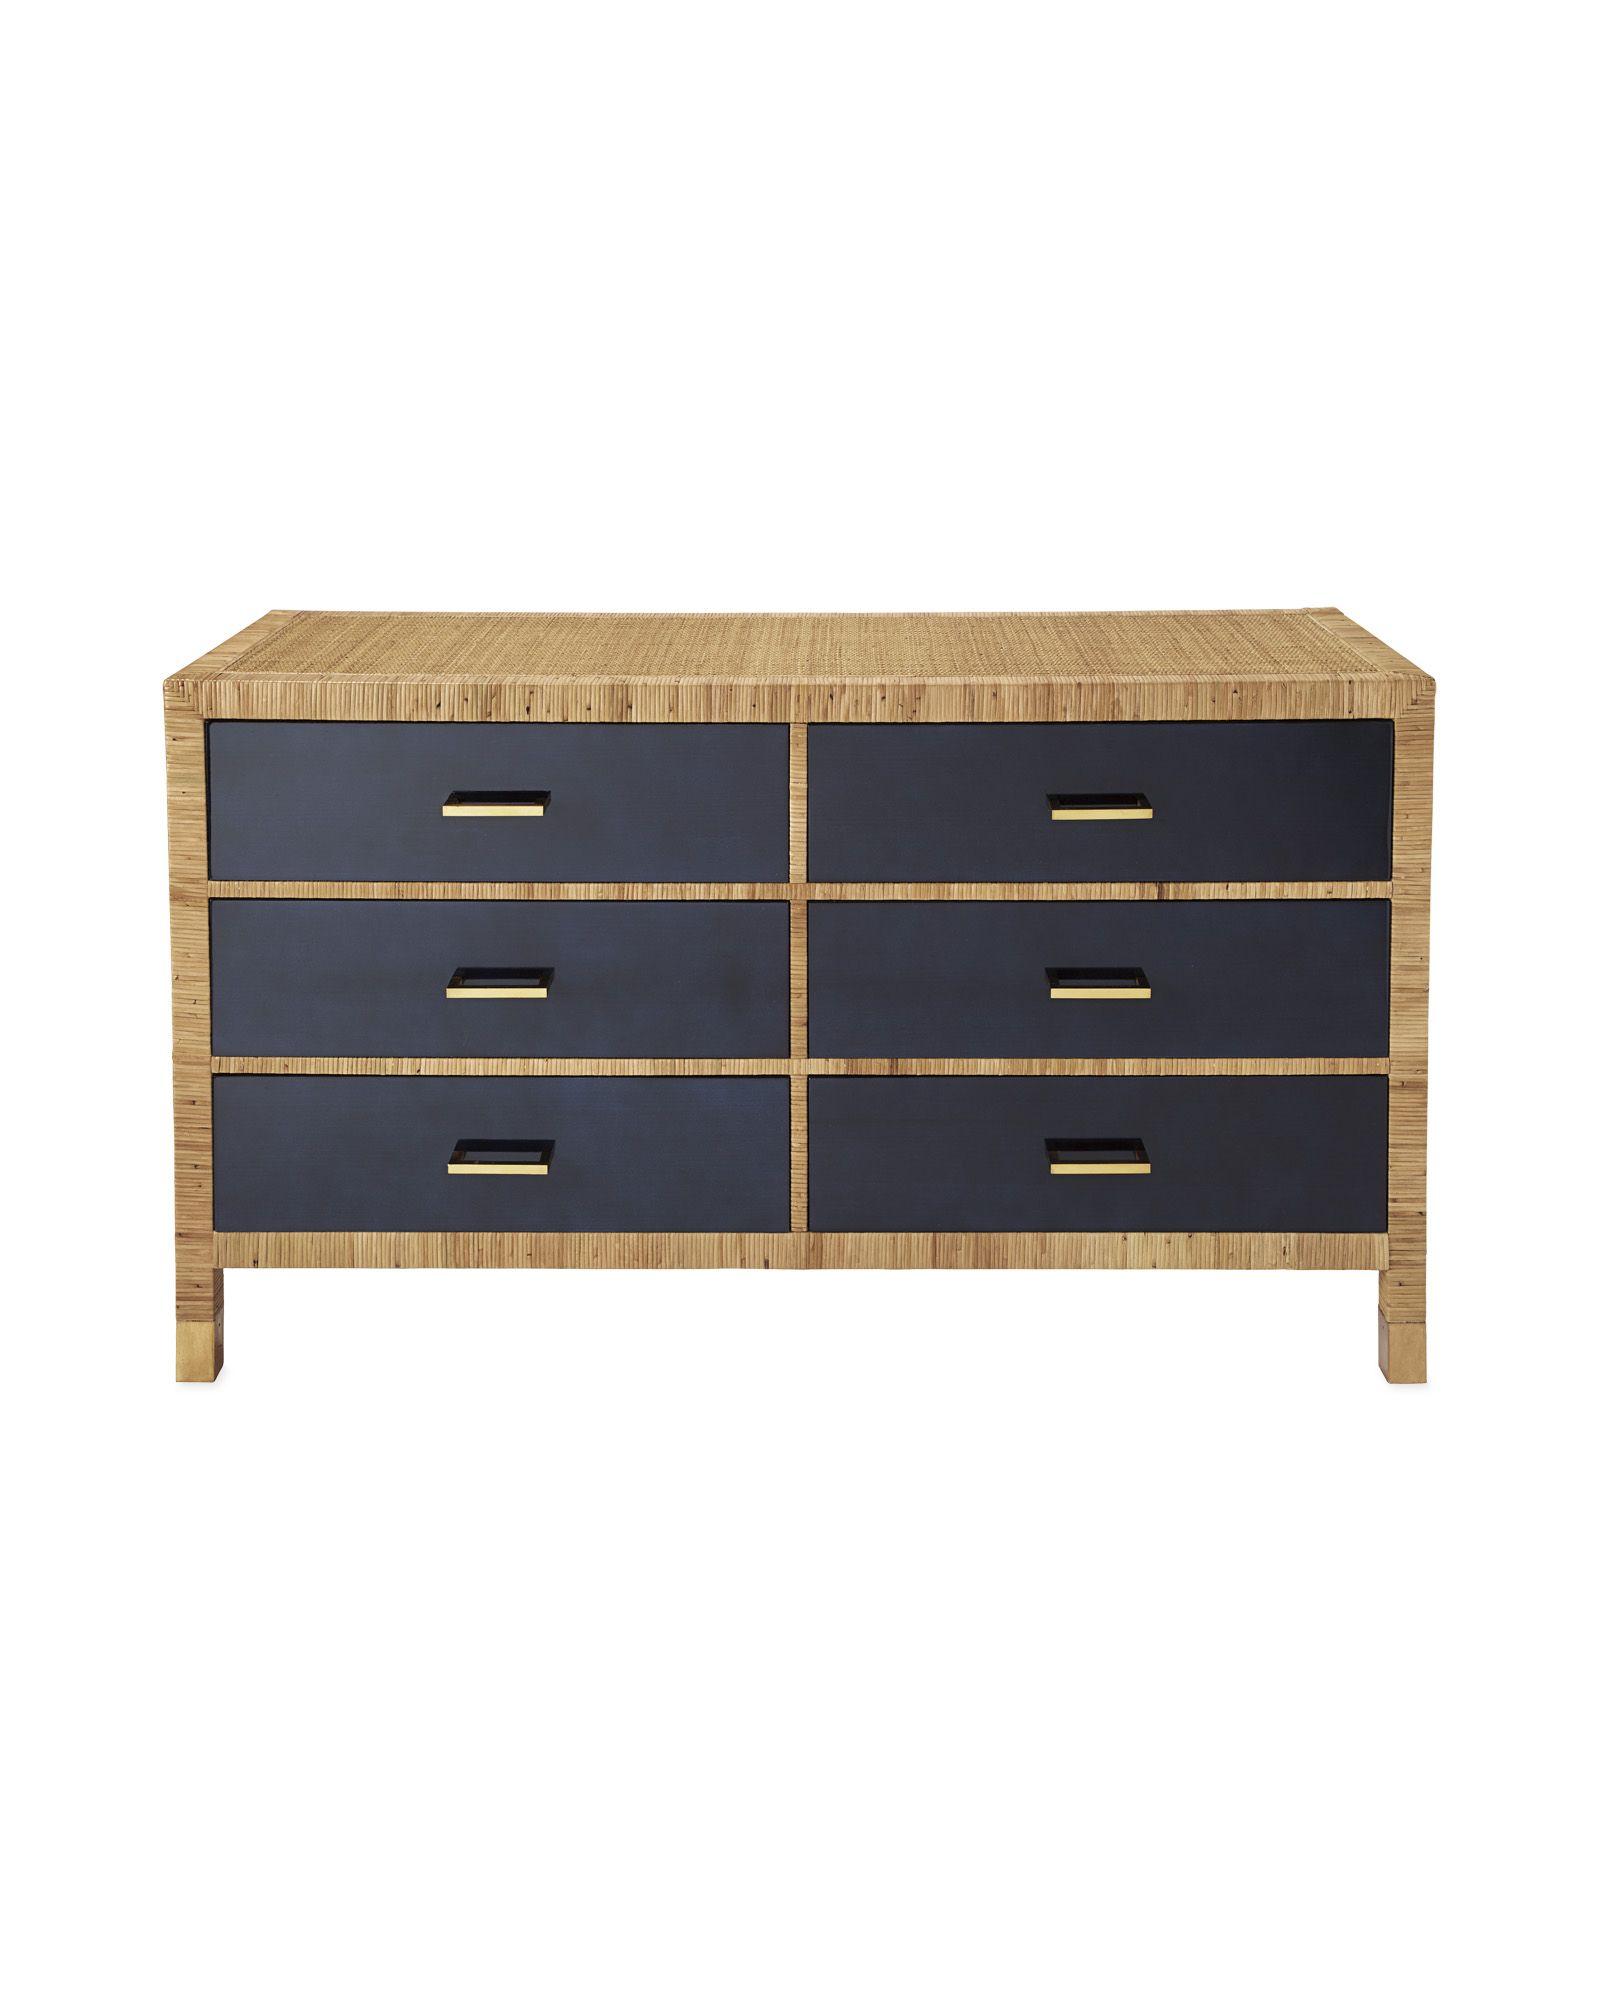 Balboa Dresser Wide Dresser Blue Dresser Dressers For Sale [ 2000 x 1600 Pixel ]